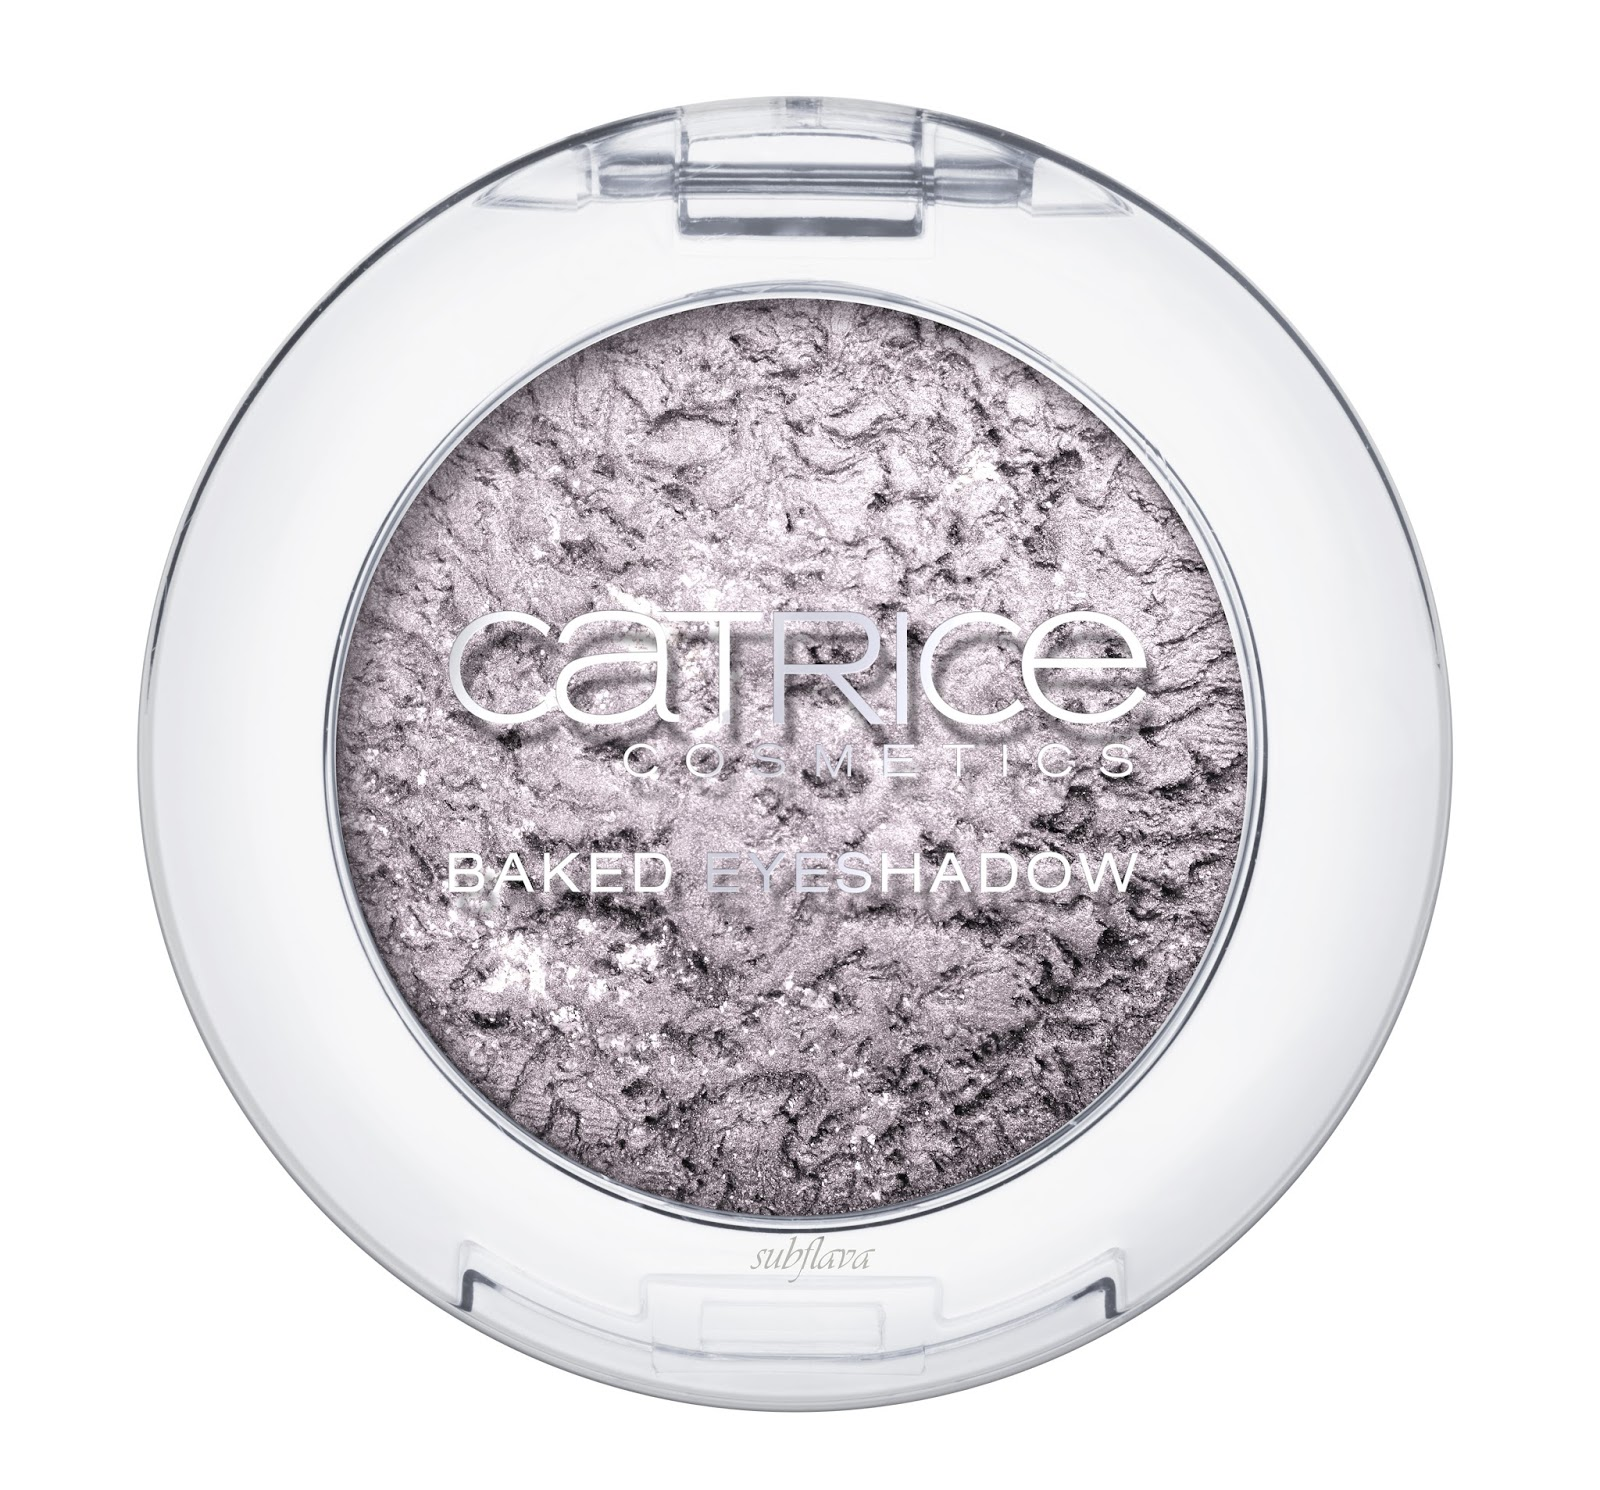 Celtica-catrice